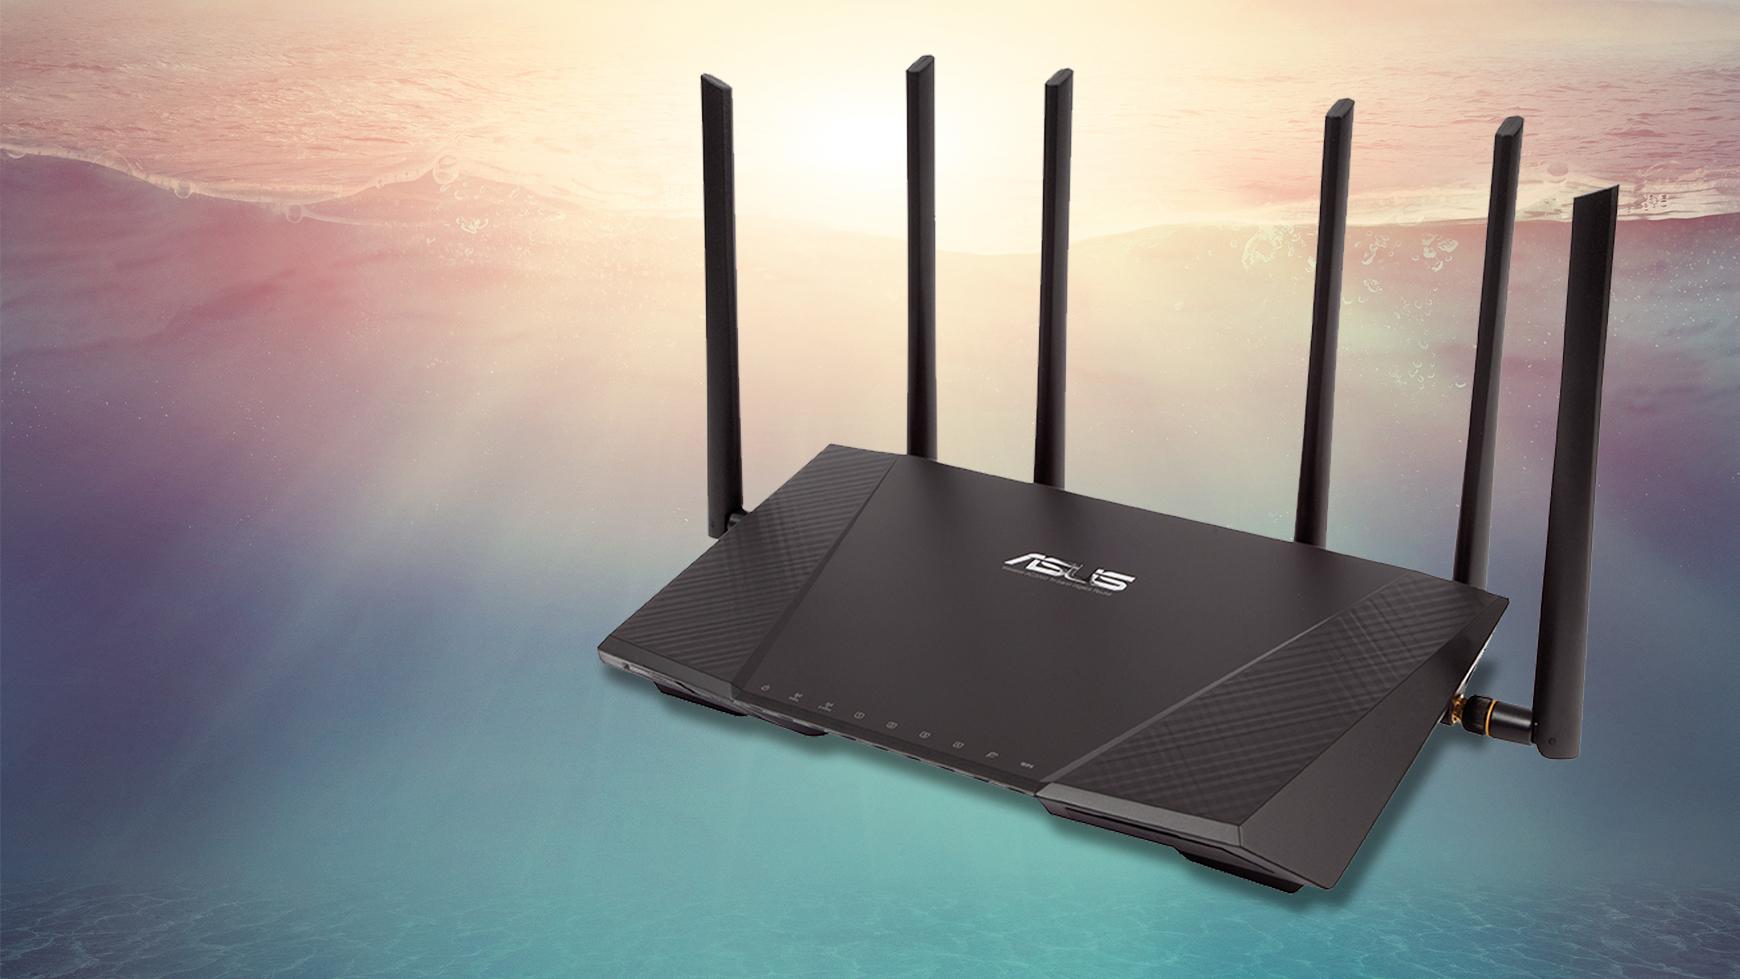 Asus RT AC3200 Gigabit Wifi router BT